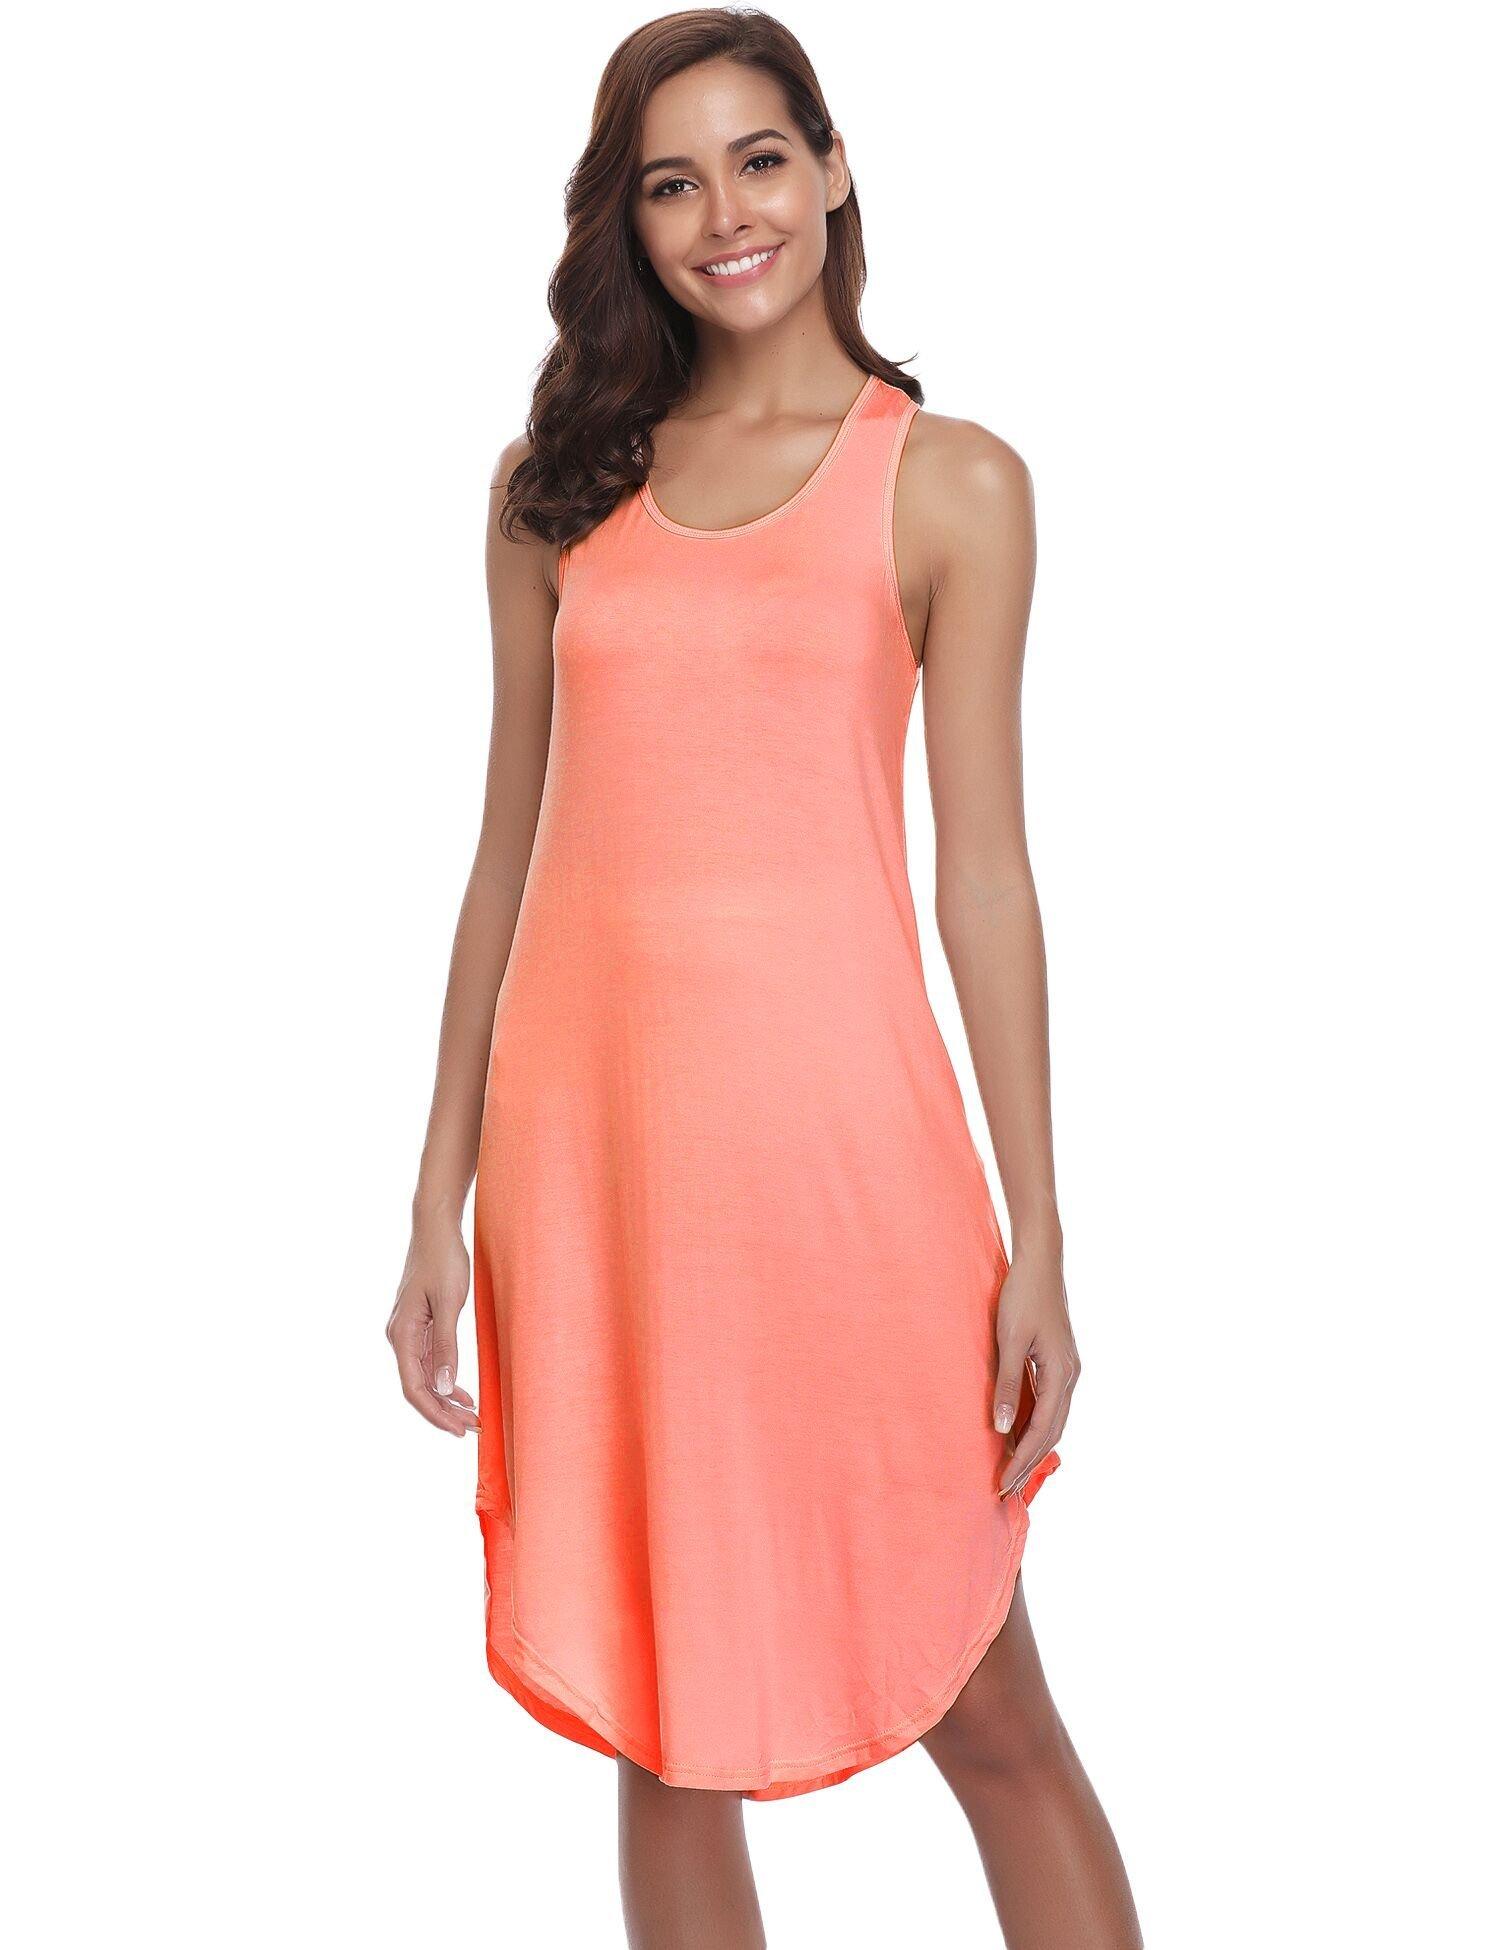 Aibrou Women's Cotton Nightgown Sleeveless Racerback Nightshirt Dress Sleepwear (Orange, Small)